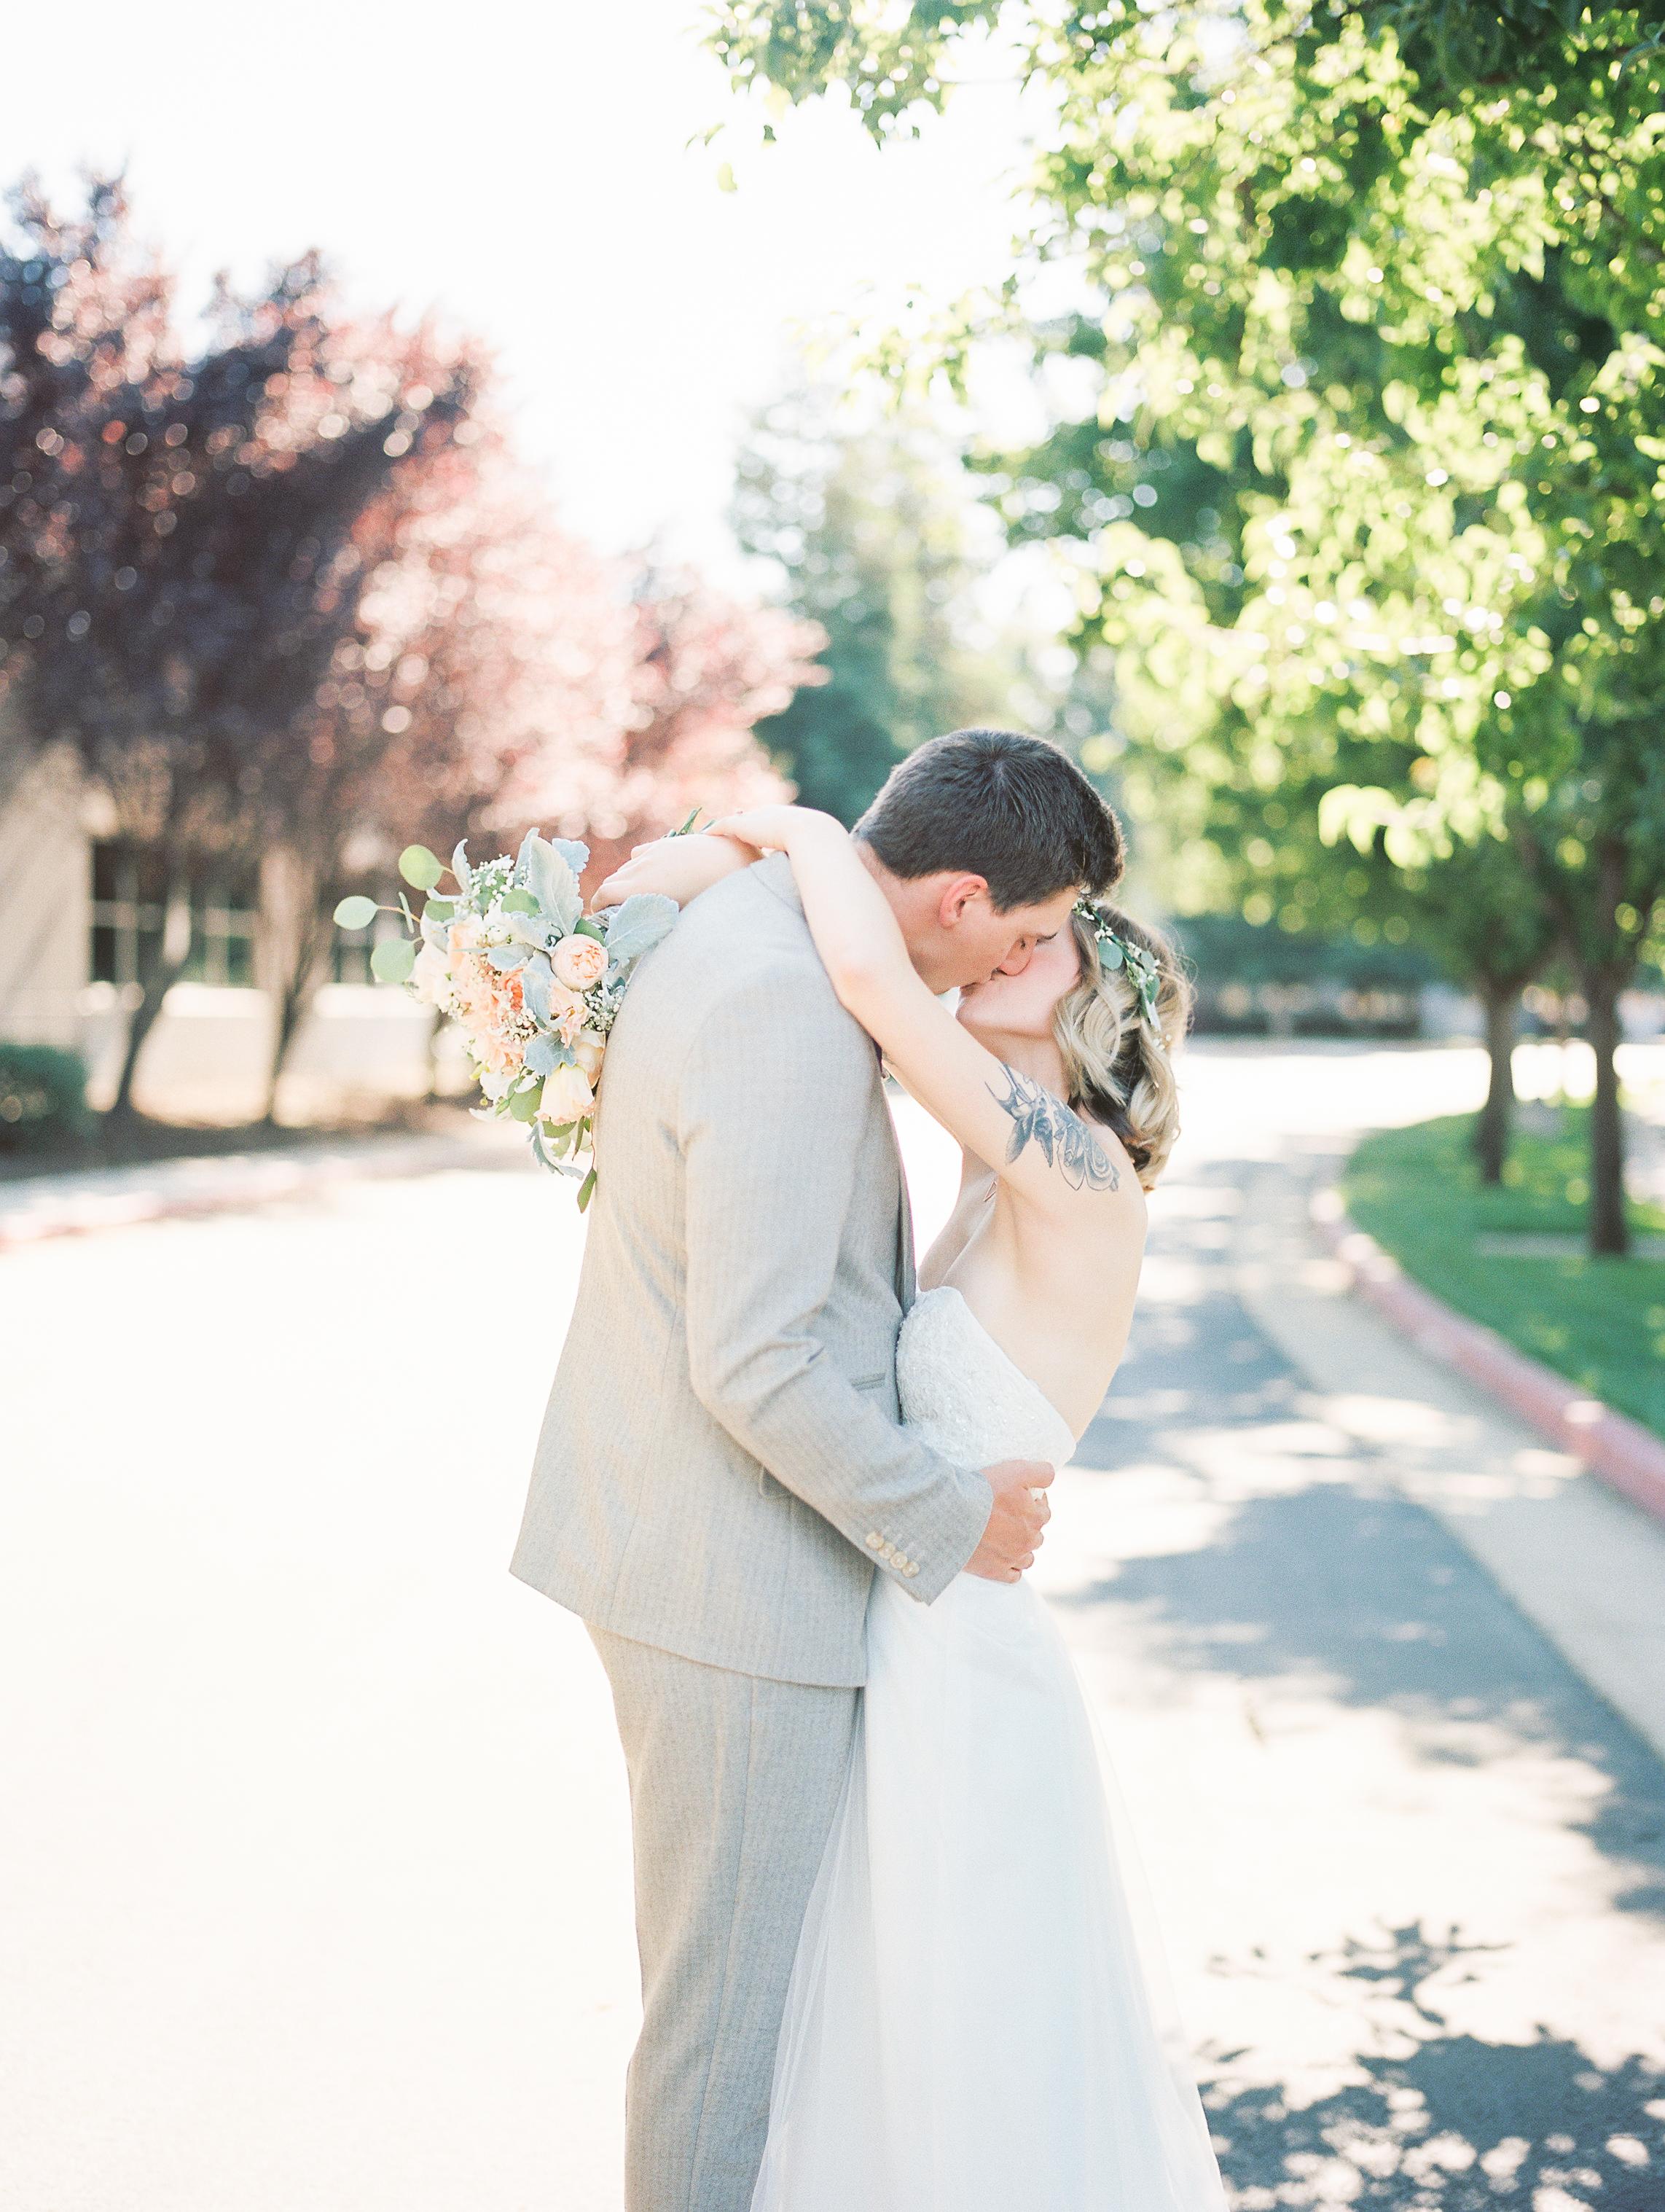 clayton+kennedy-married-filmscans-3.jpg